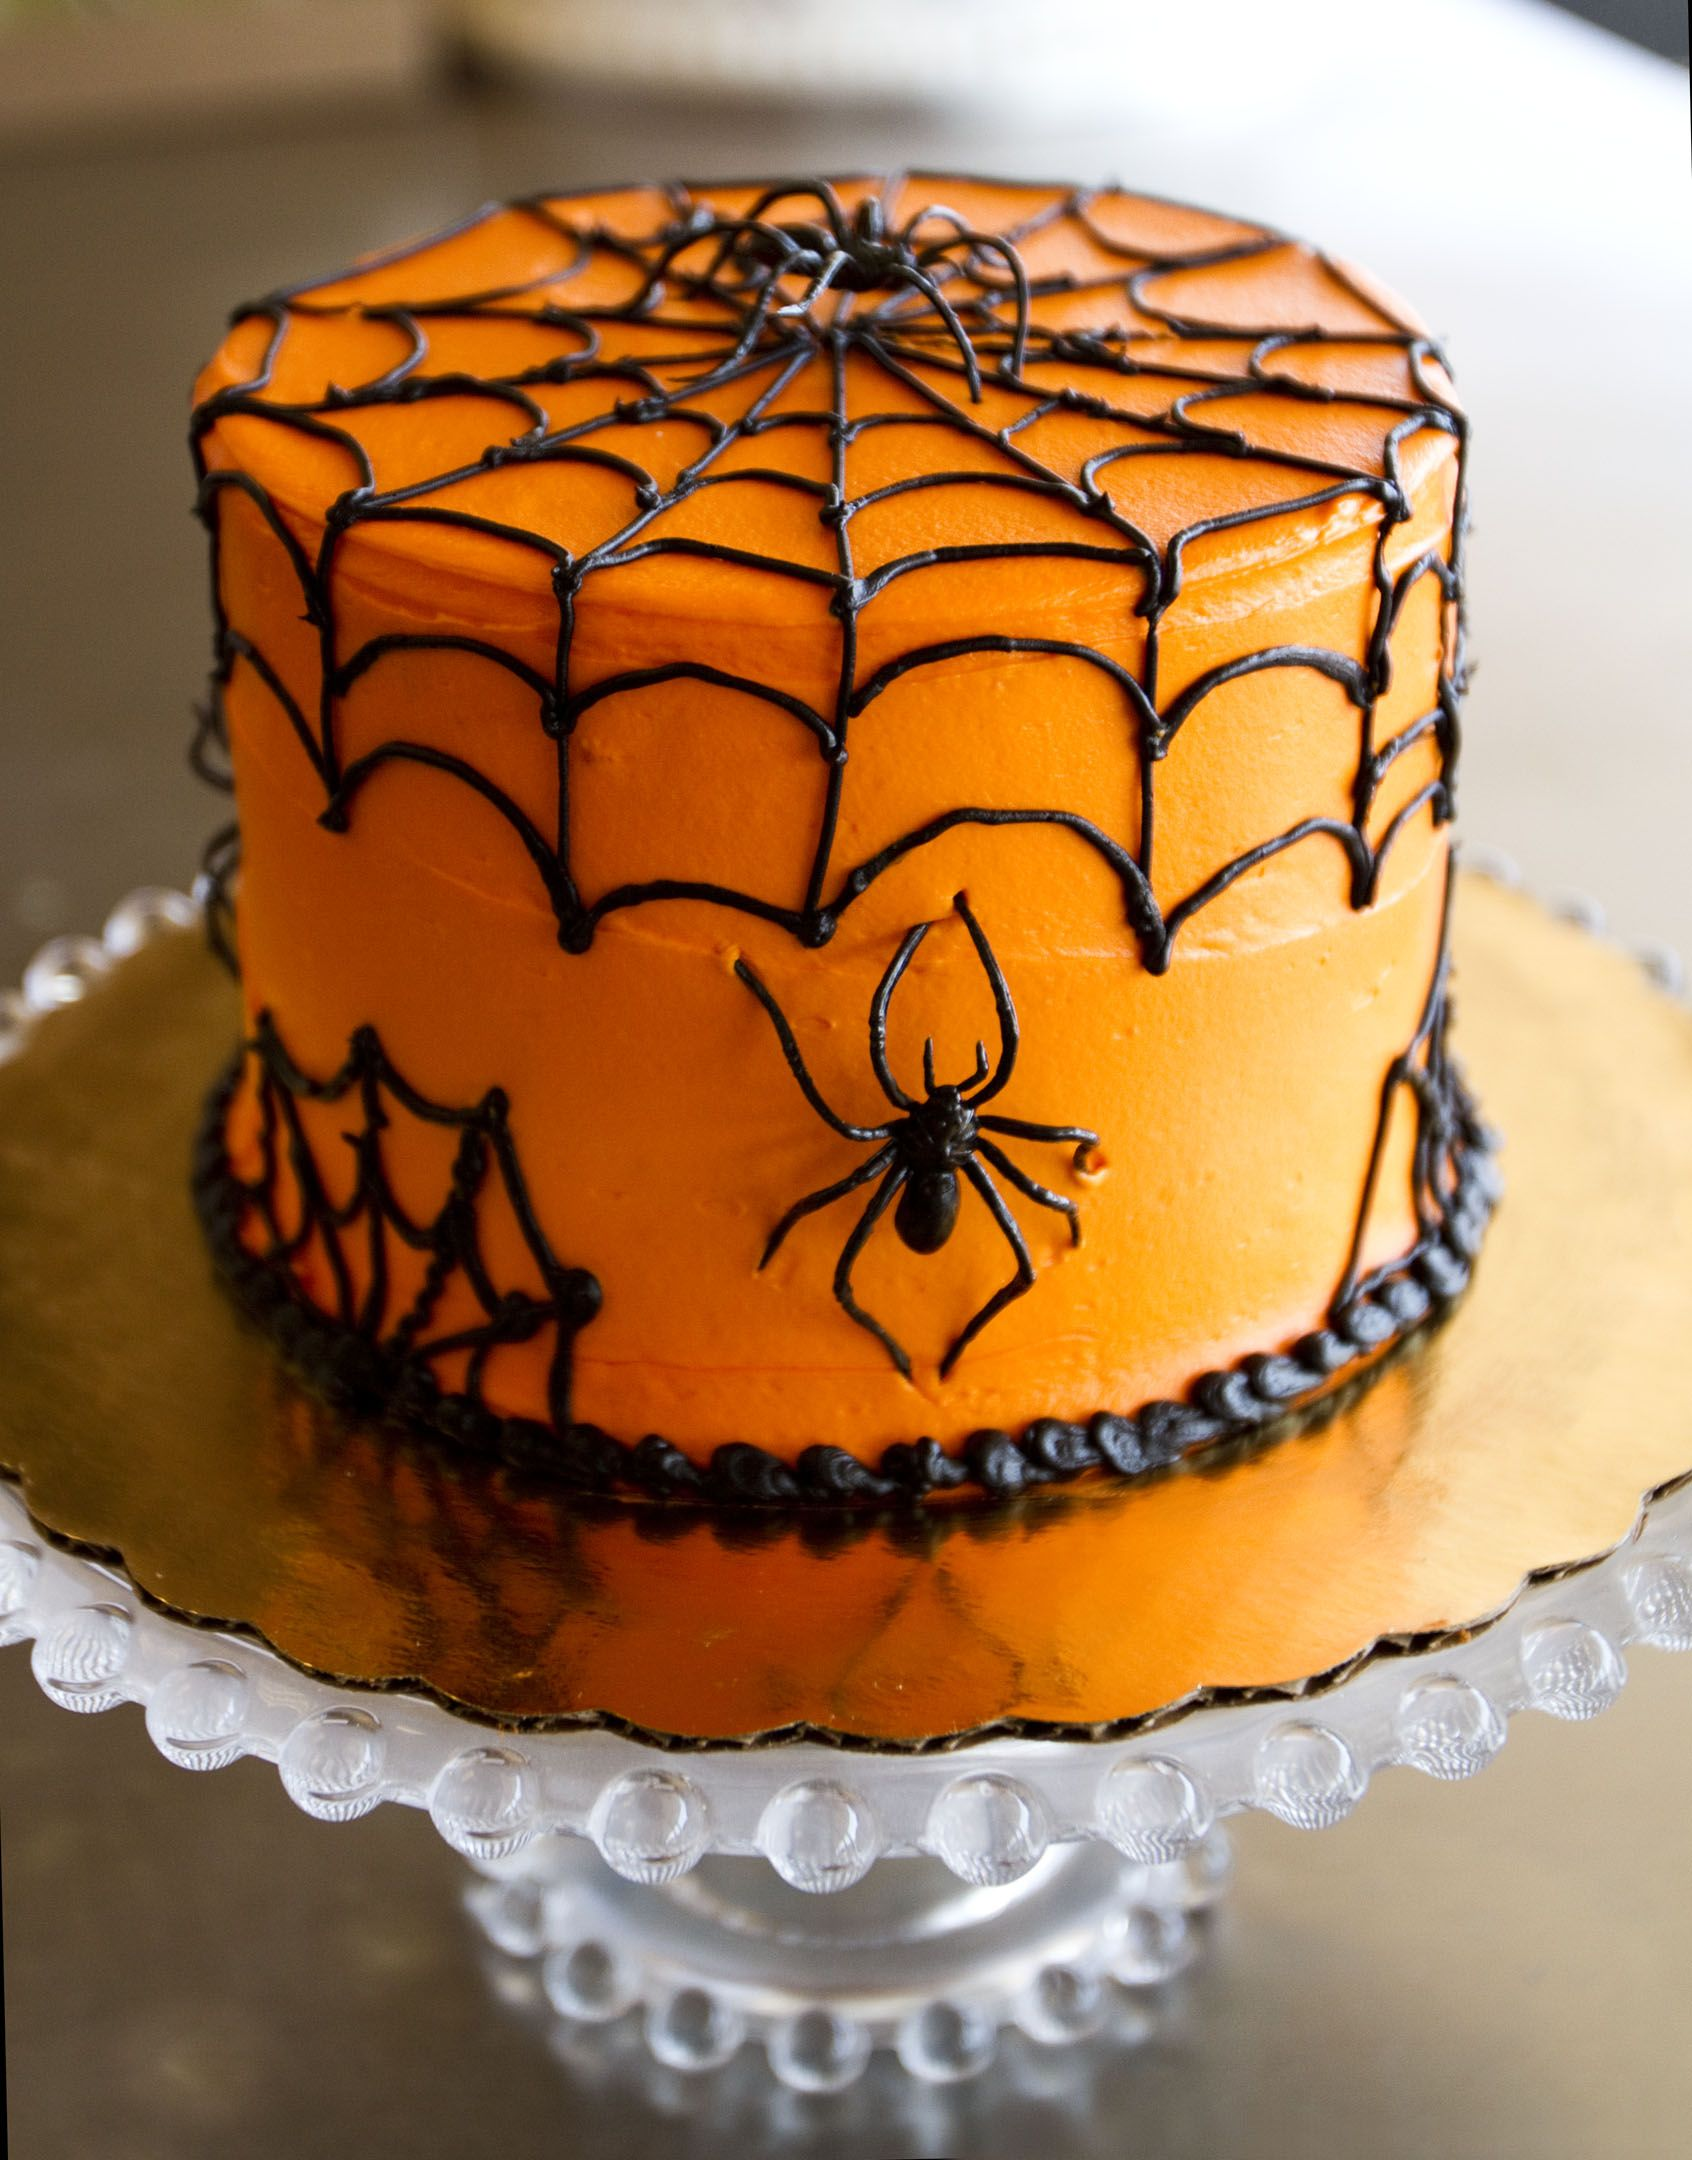 Bakery Cakes In 2020 Halloween Cakes Halloween Desserts